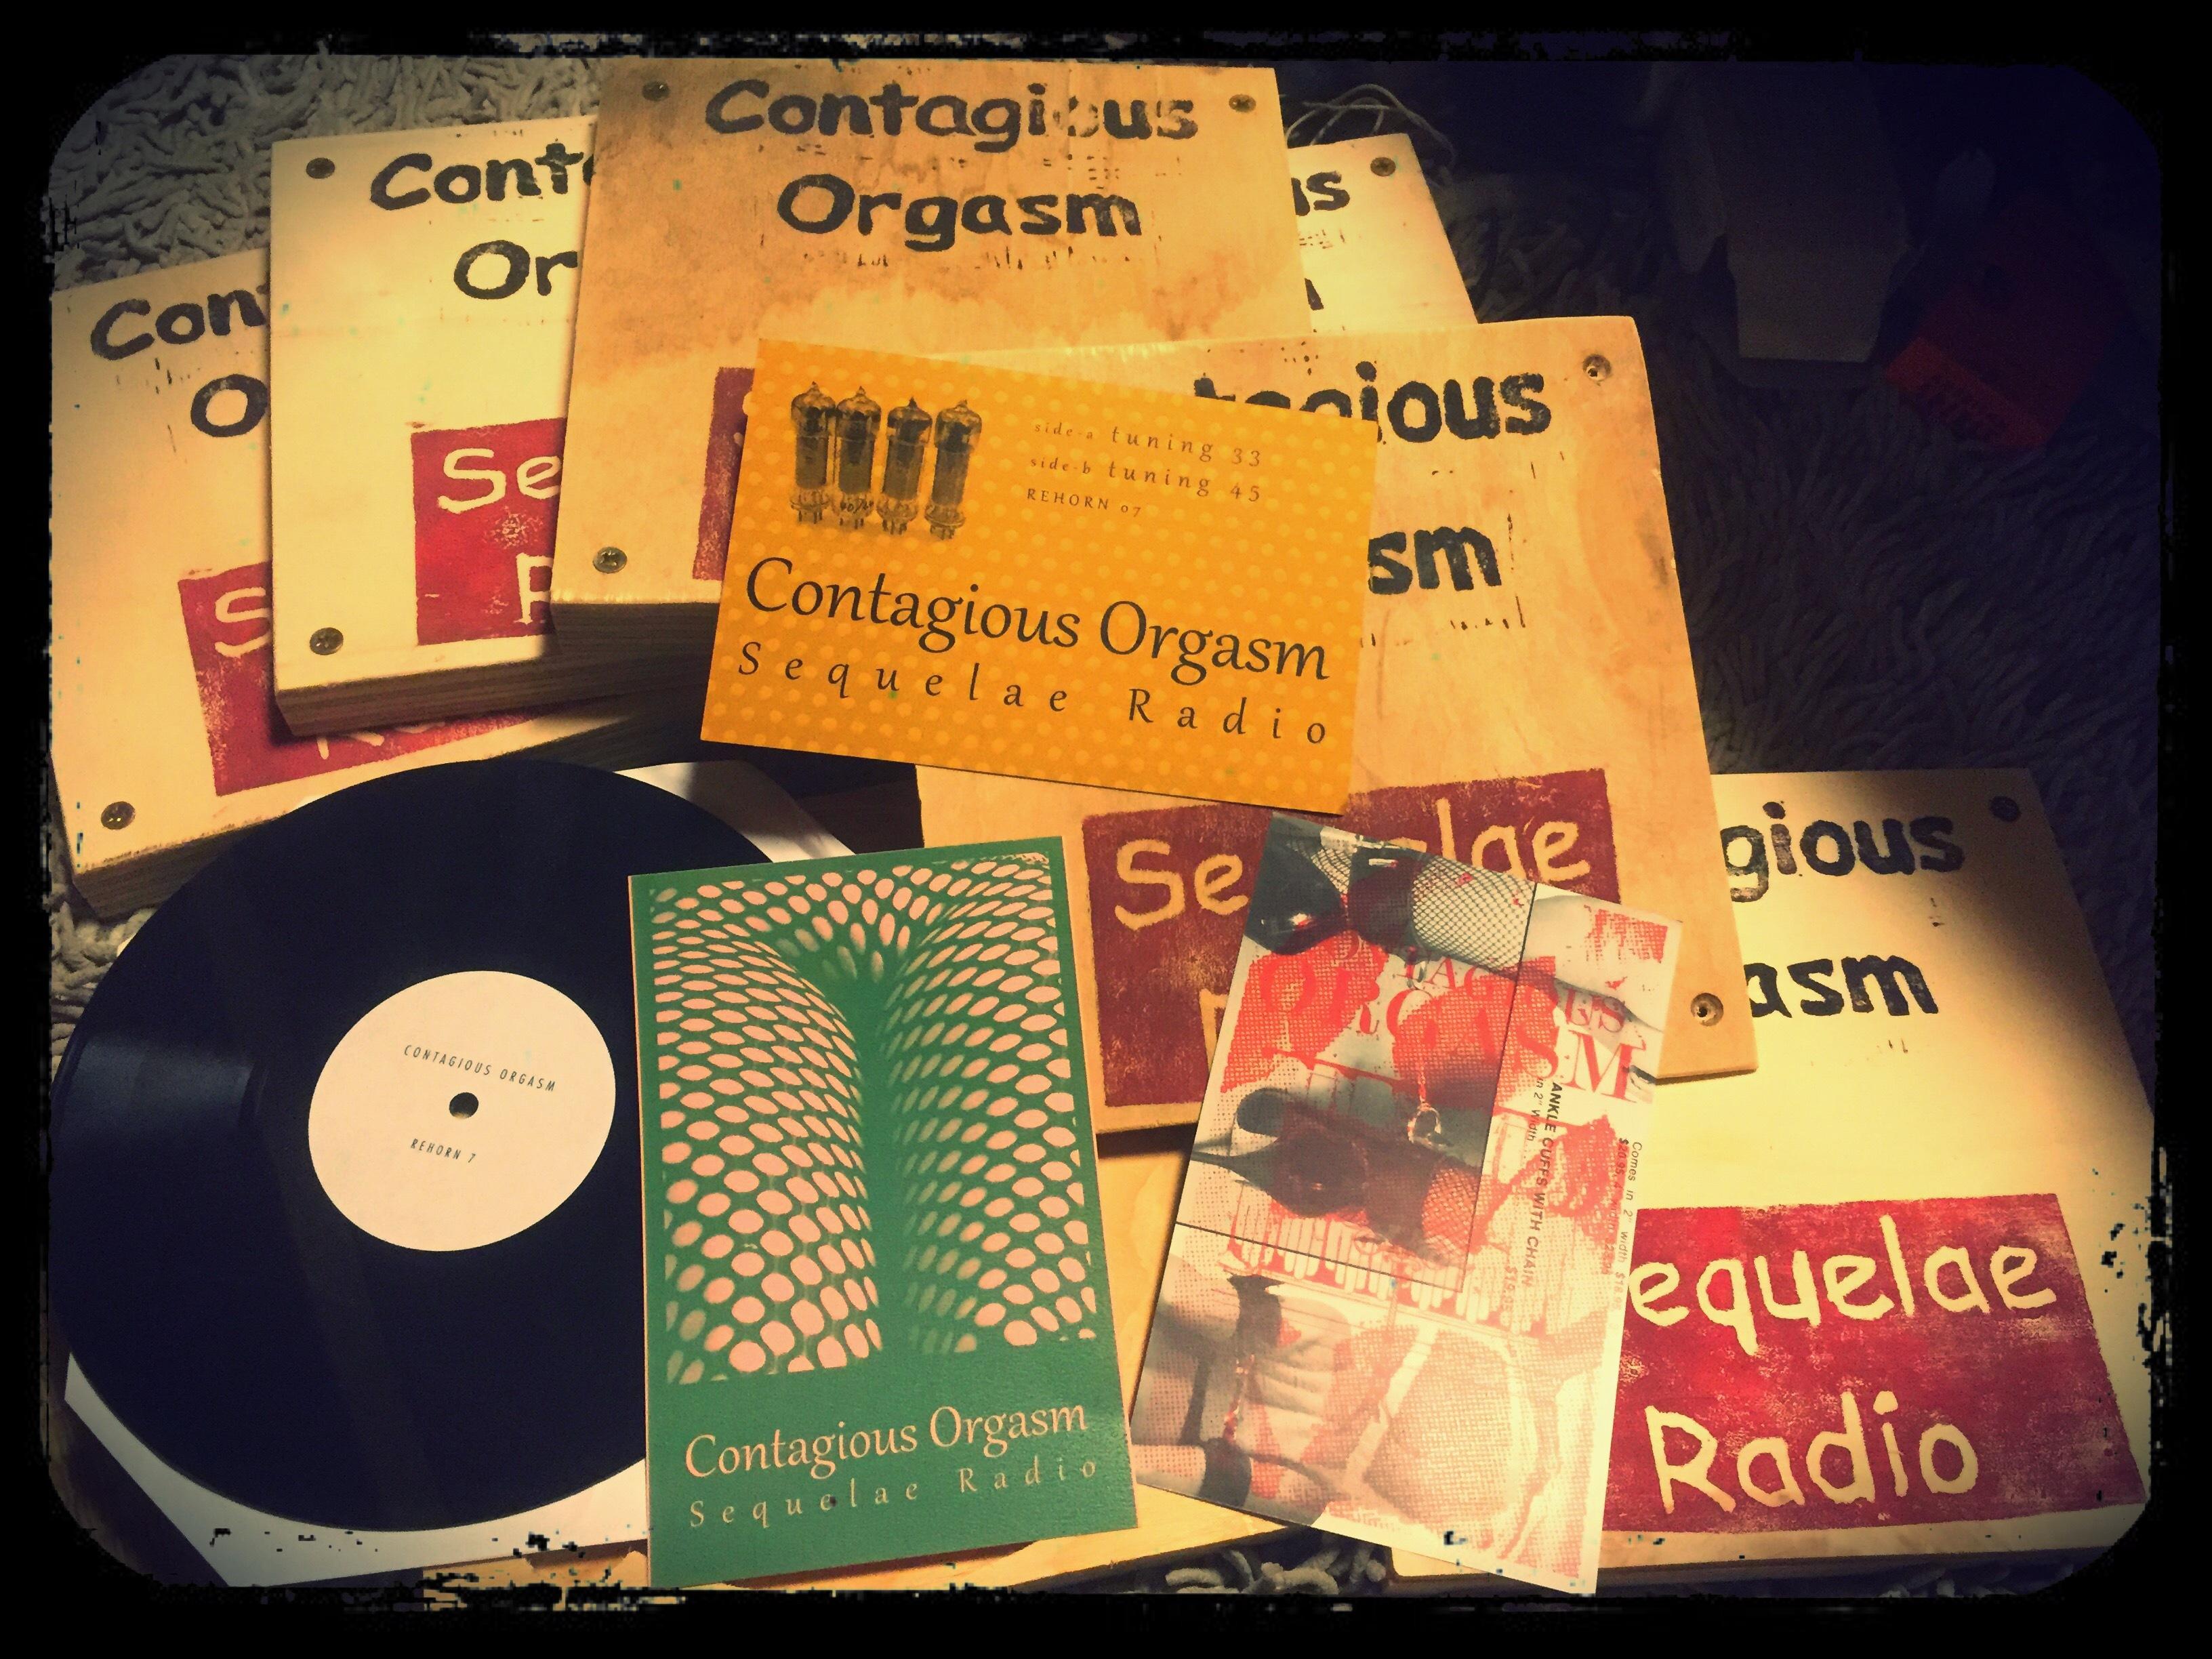 Contagious Orgasm - Sequelae Radio  8インチ Lathe Cut - 画像3